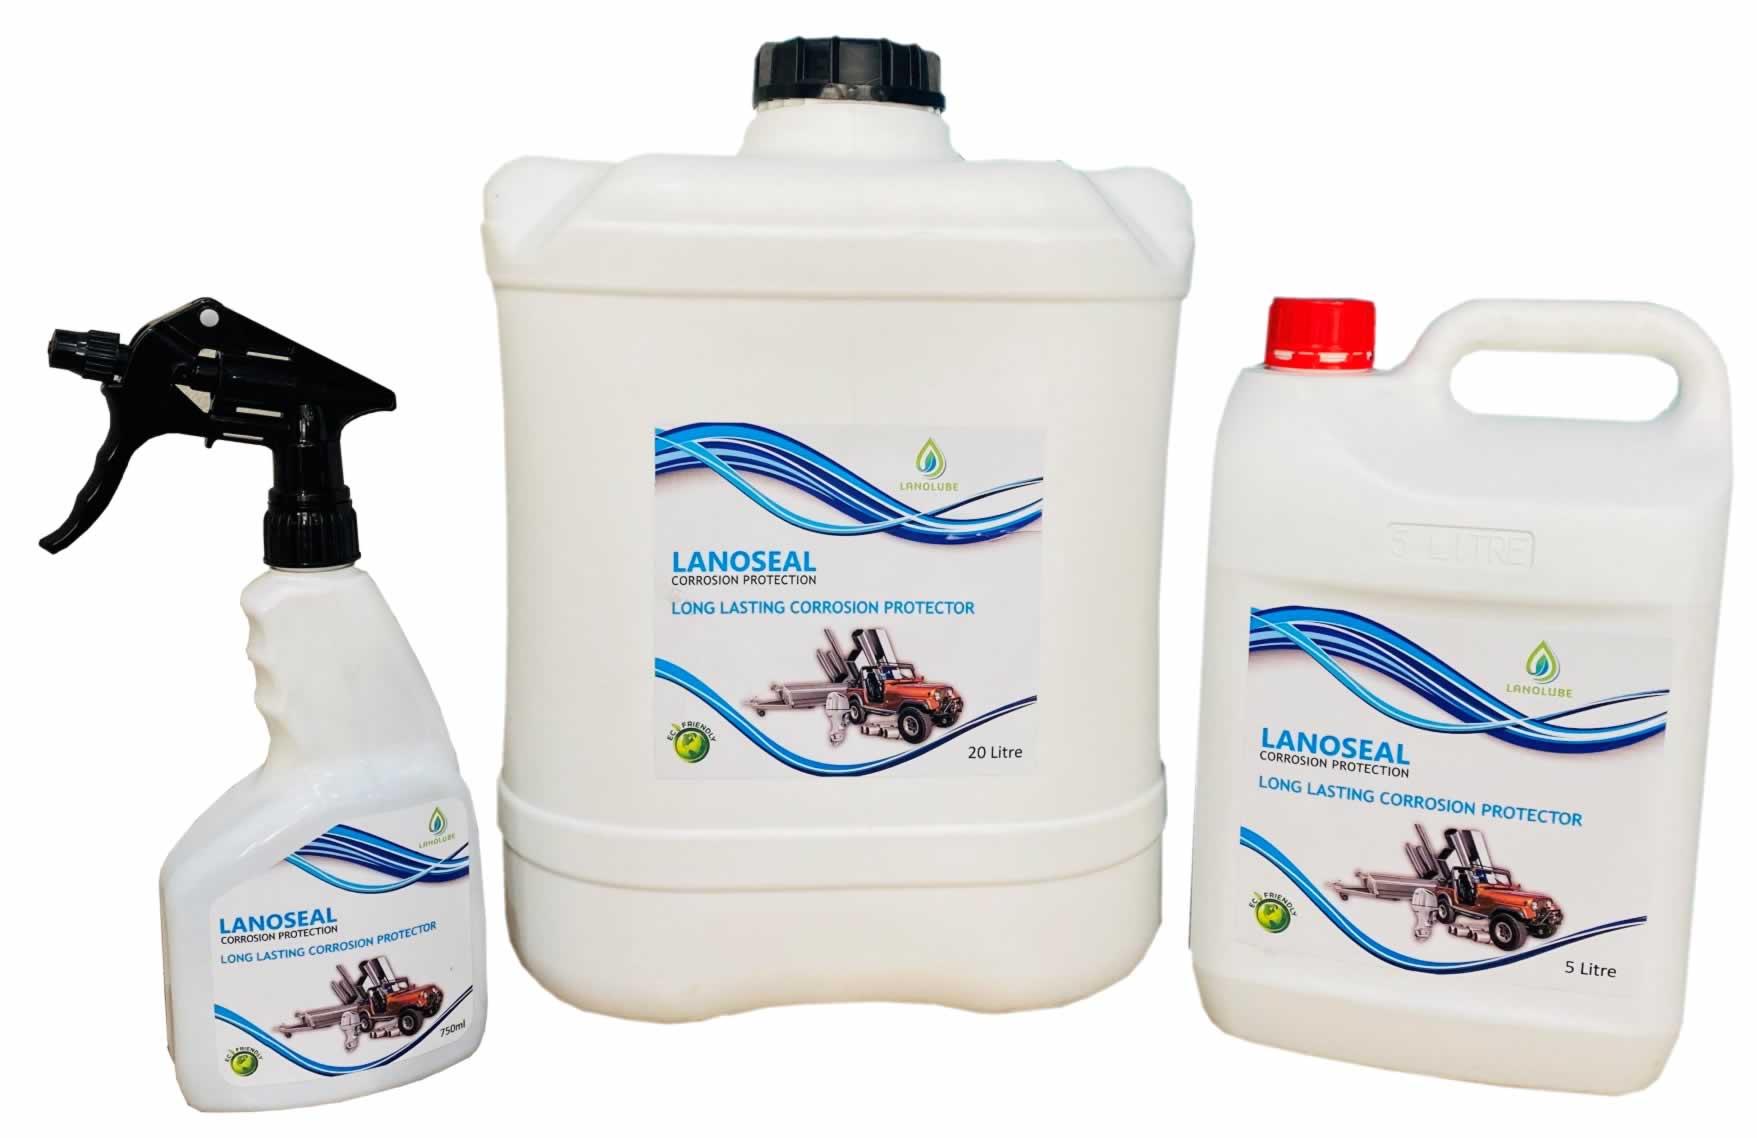 Lanolin Corrosion Protector